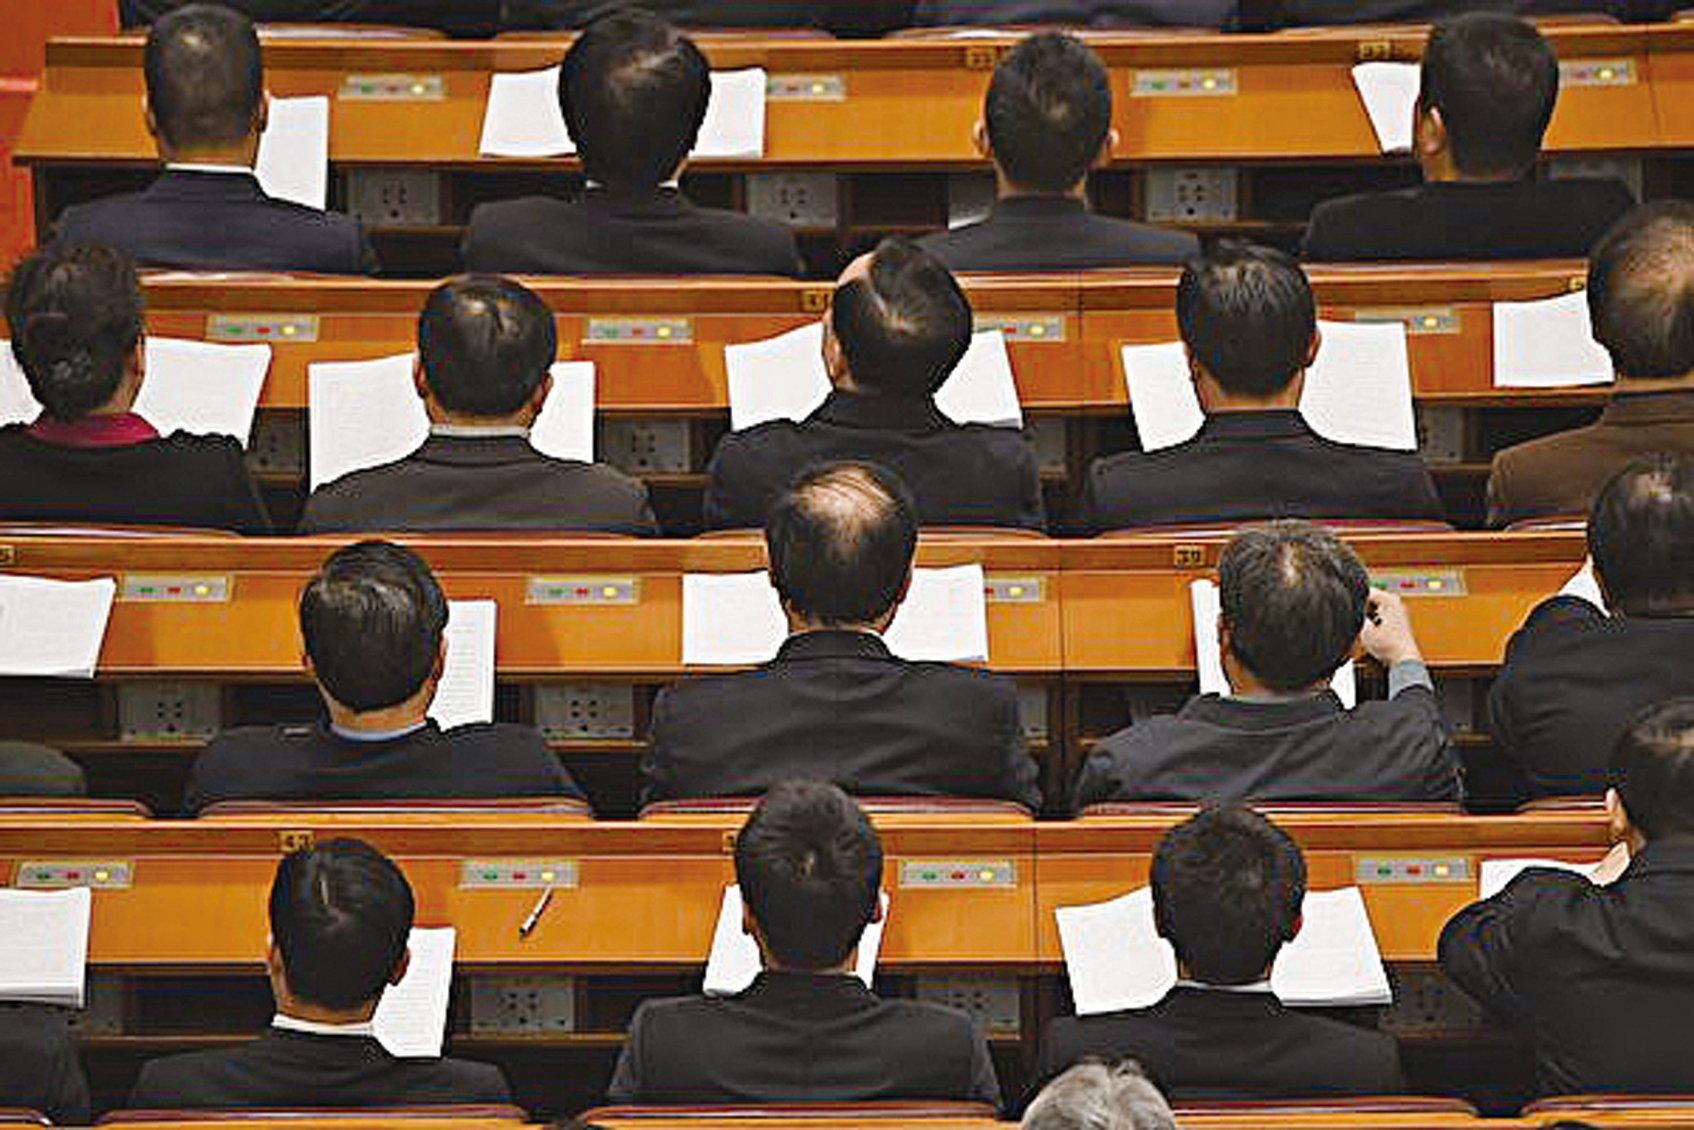 全國人大會議聽取國務院機構改革方案。(GREG BAKER/AFP/Getty Images)